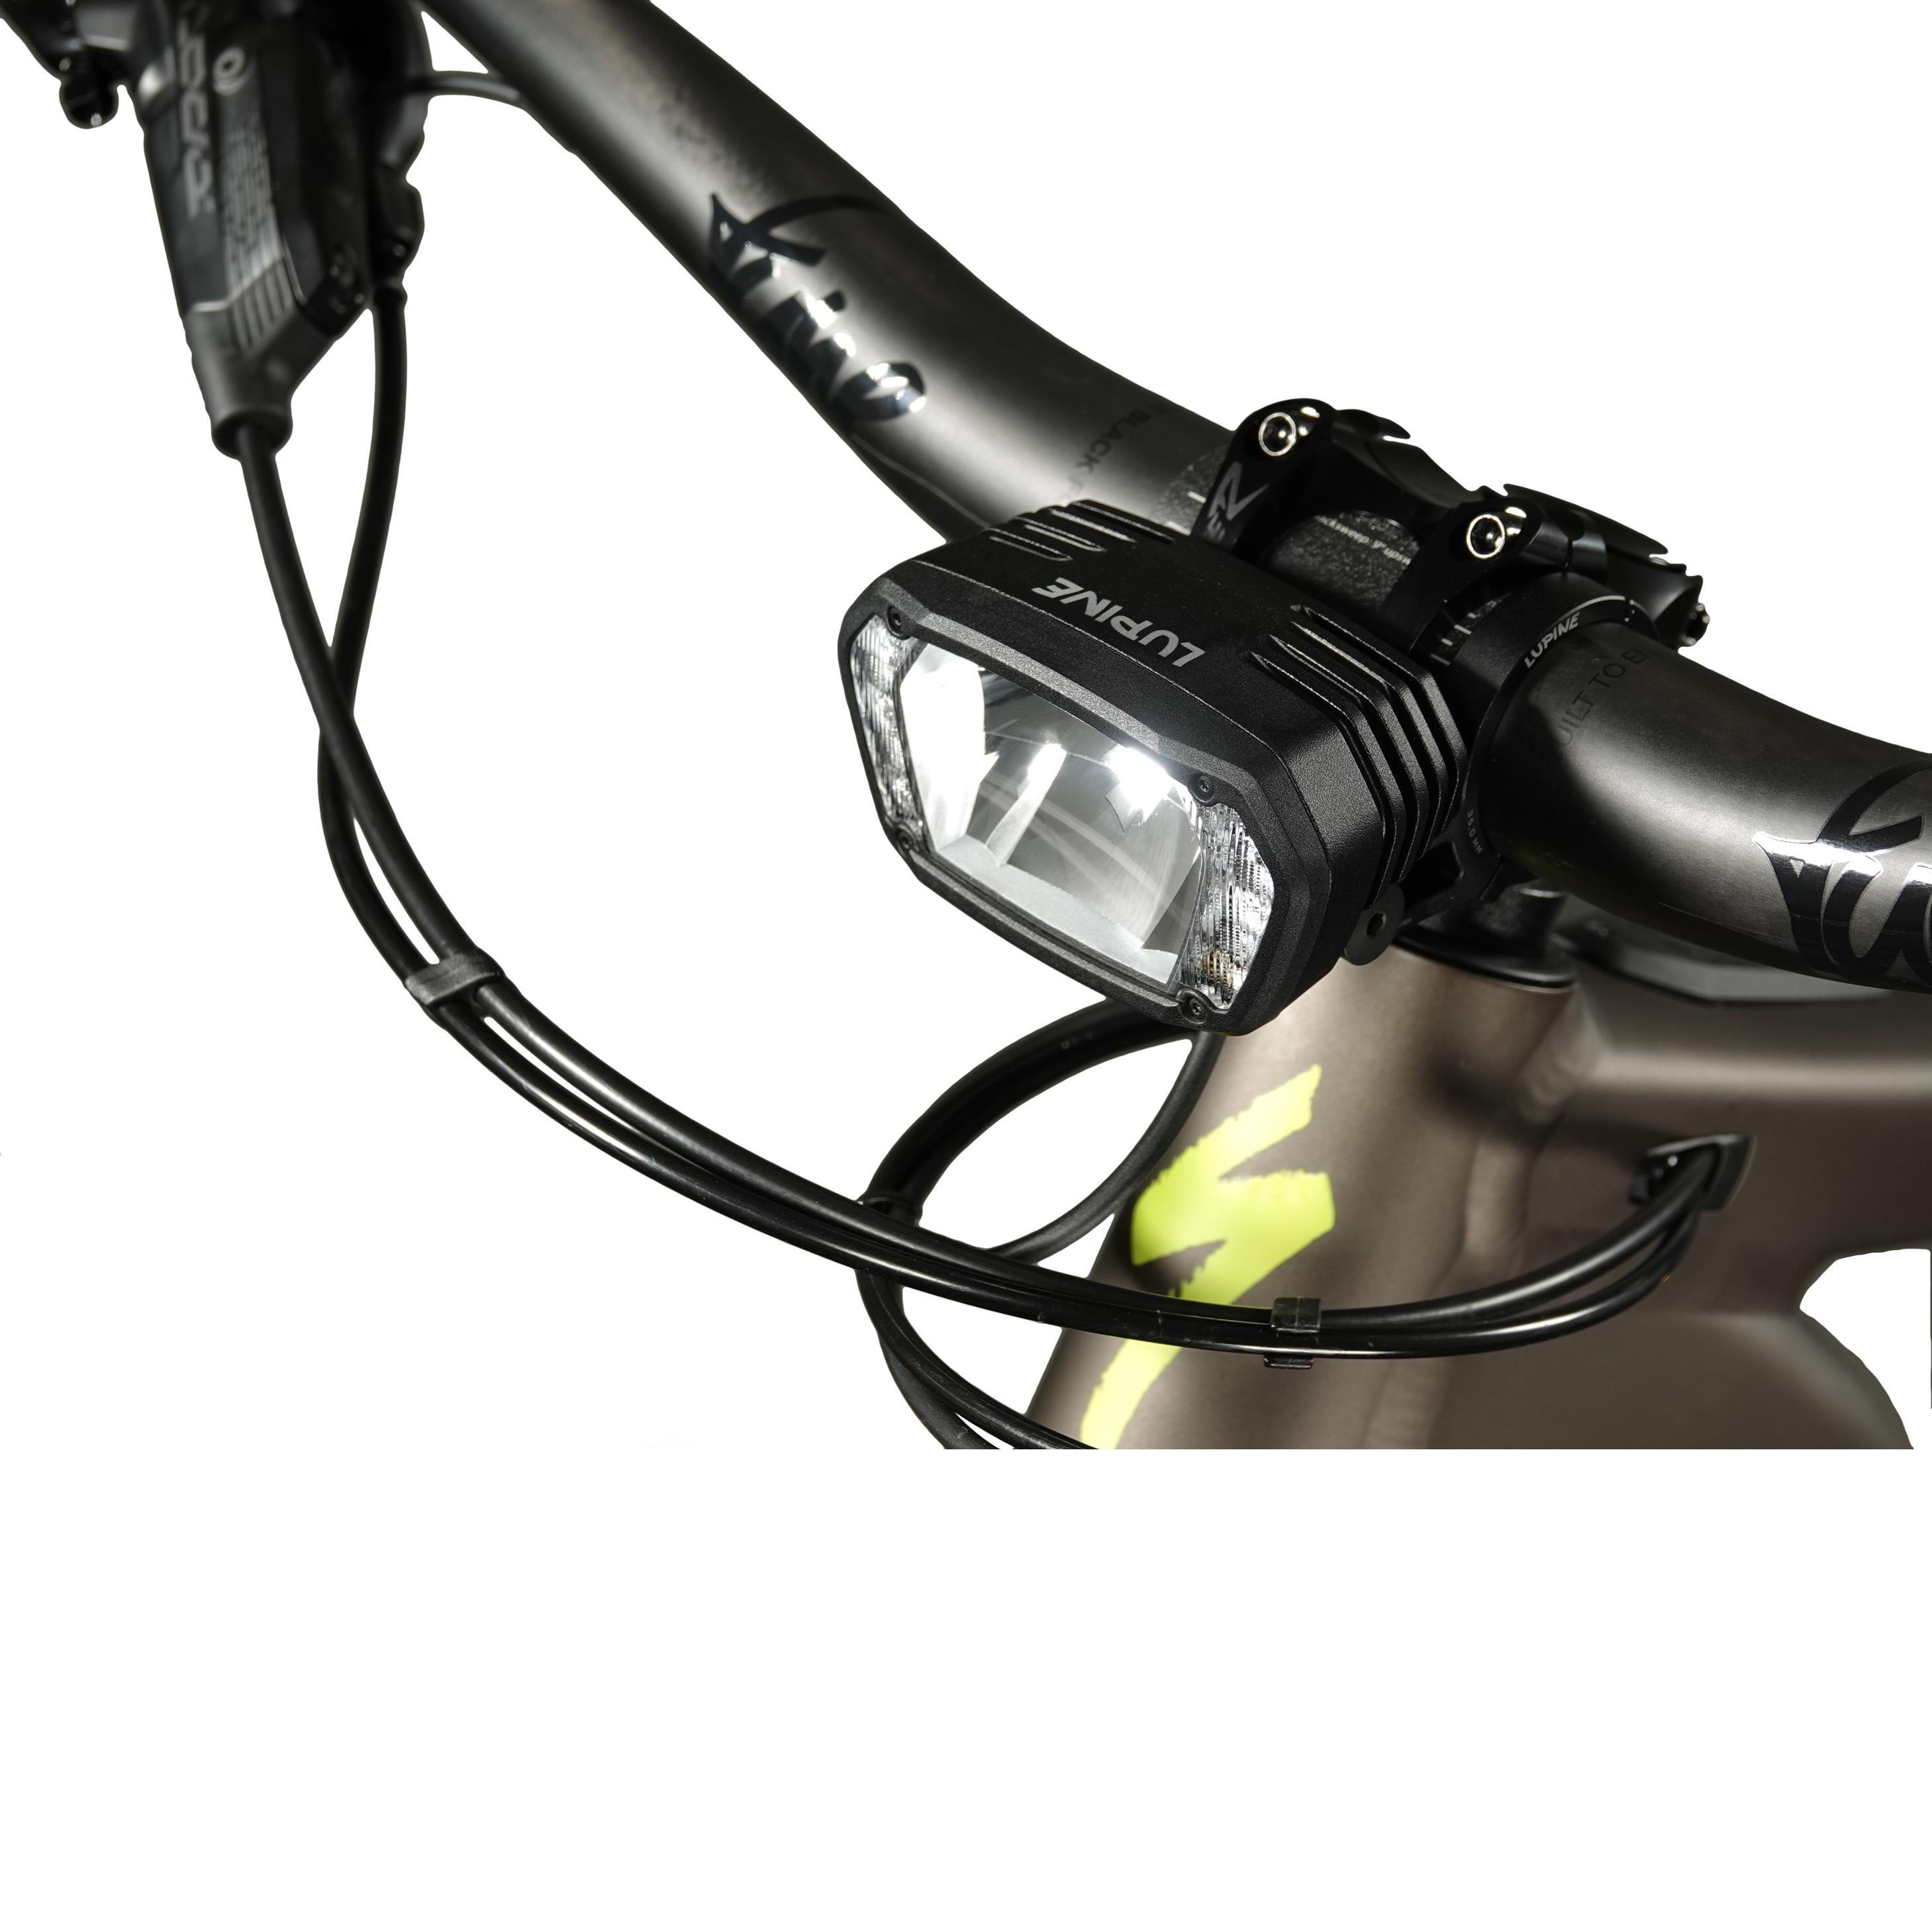 Lupine SLX Bosch 31.8mm